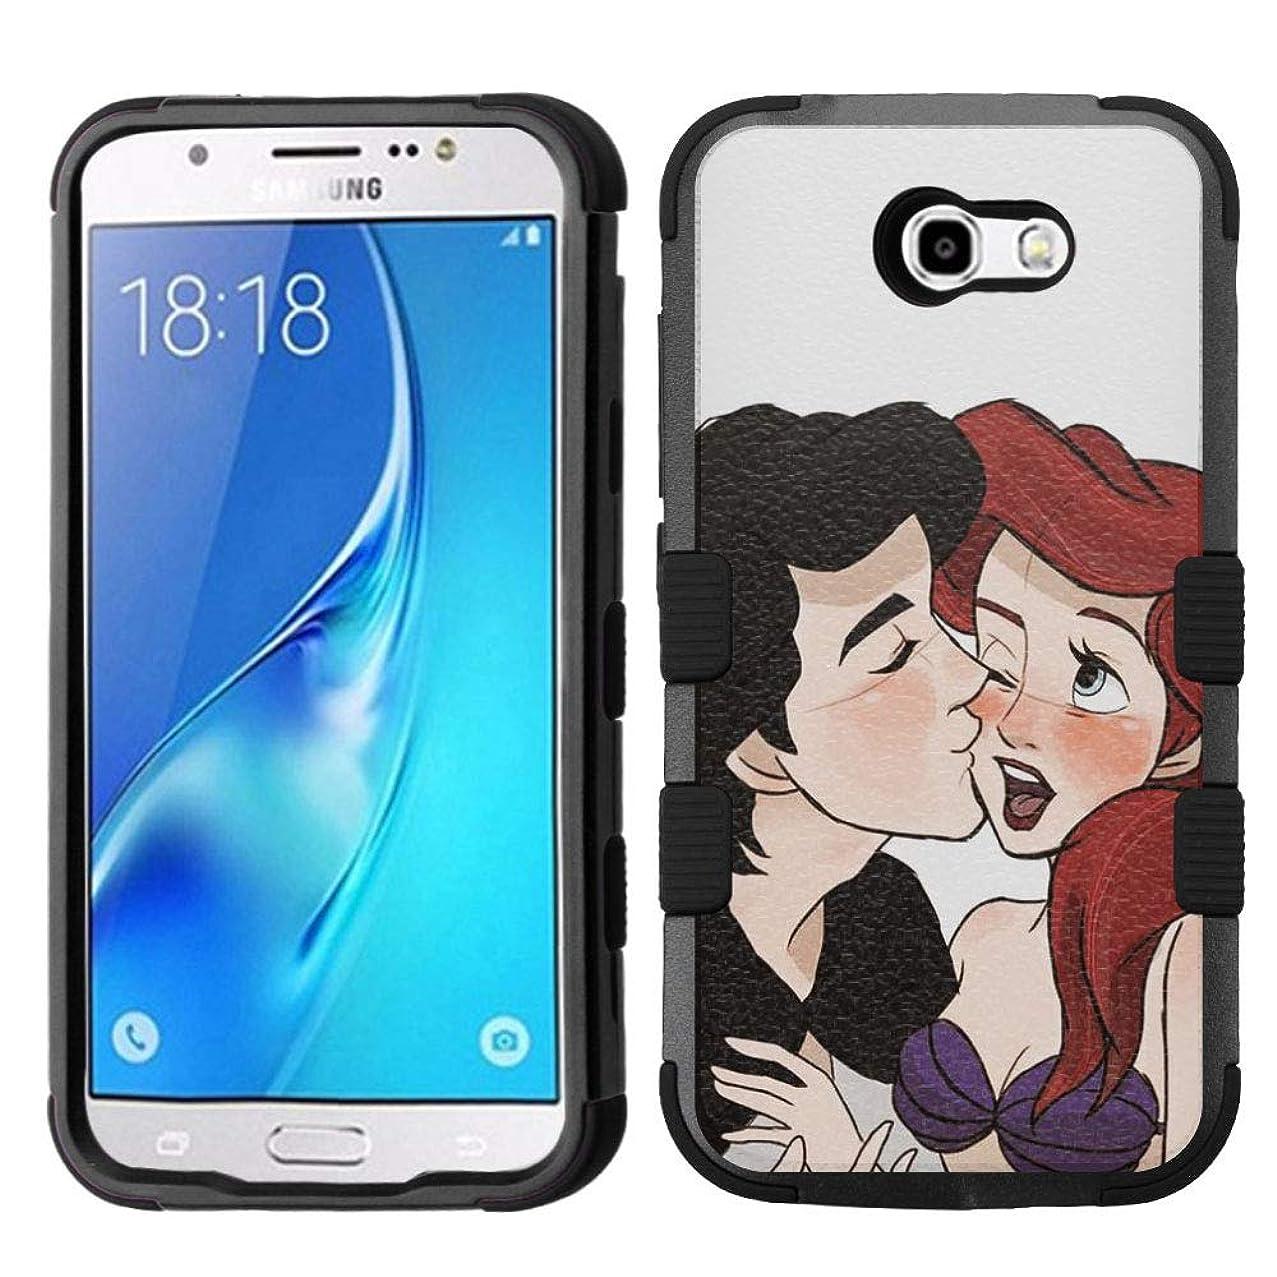 for Galaxy J7 Prime, J727 (2017), Galaxy J7 V, Galaxy J7 Perx, Galaxy J7 Sky Pro, Hard+Rubber Rugged Impact Cover Case - Ariel Mermaid #Kiss